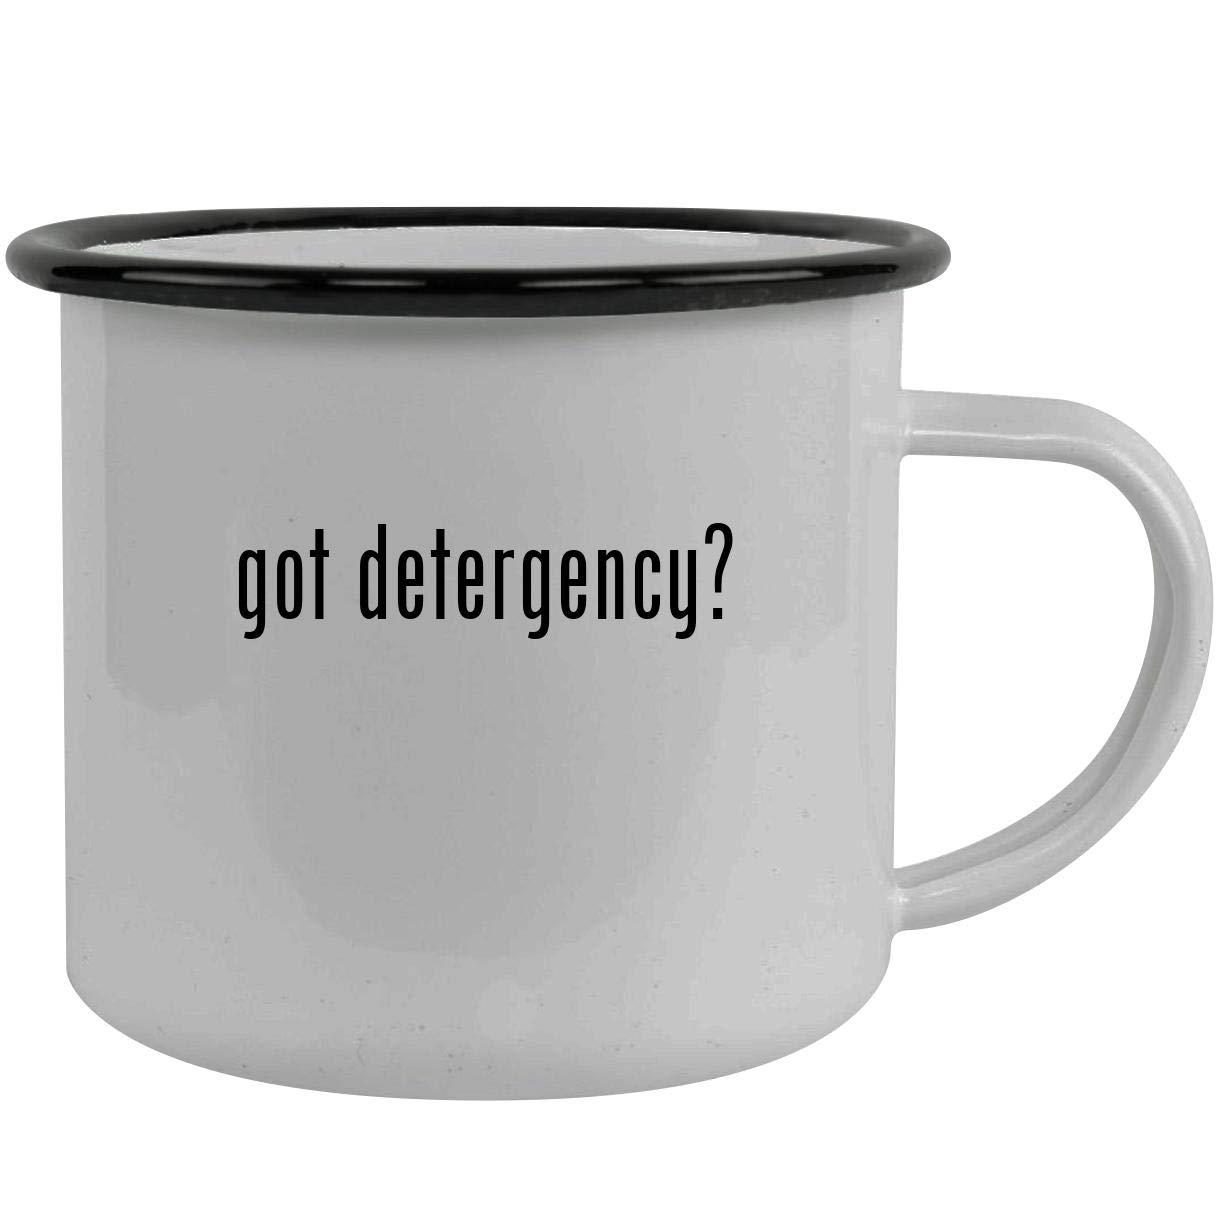 got detergency? - Stainless Steel 12oz Camping Mug, Black